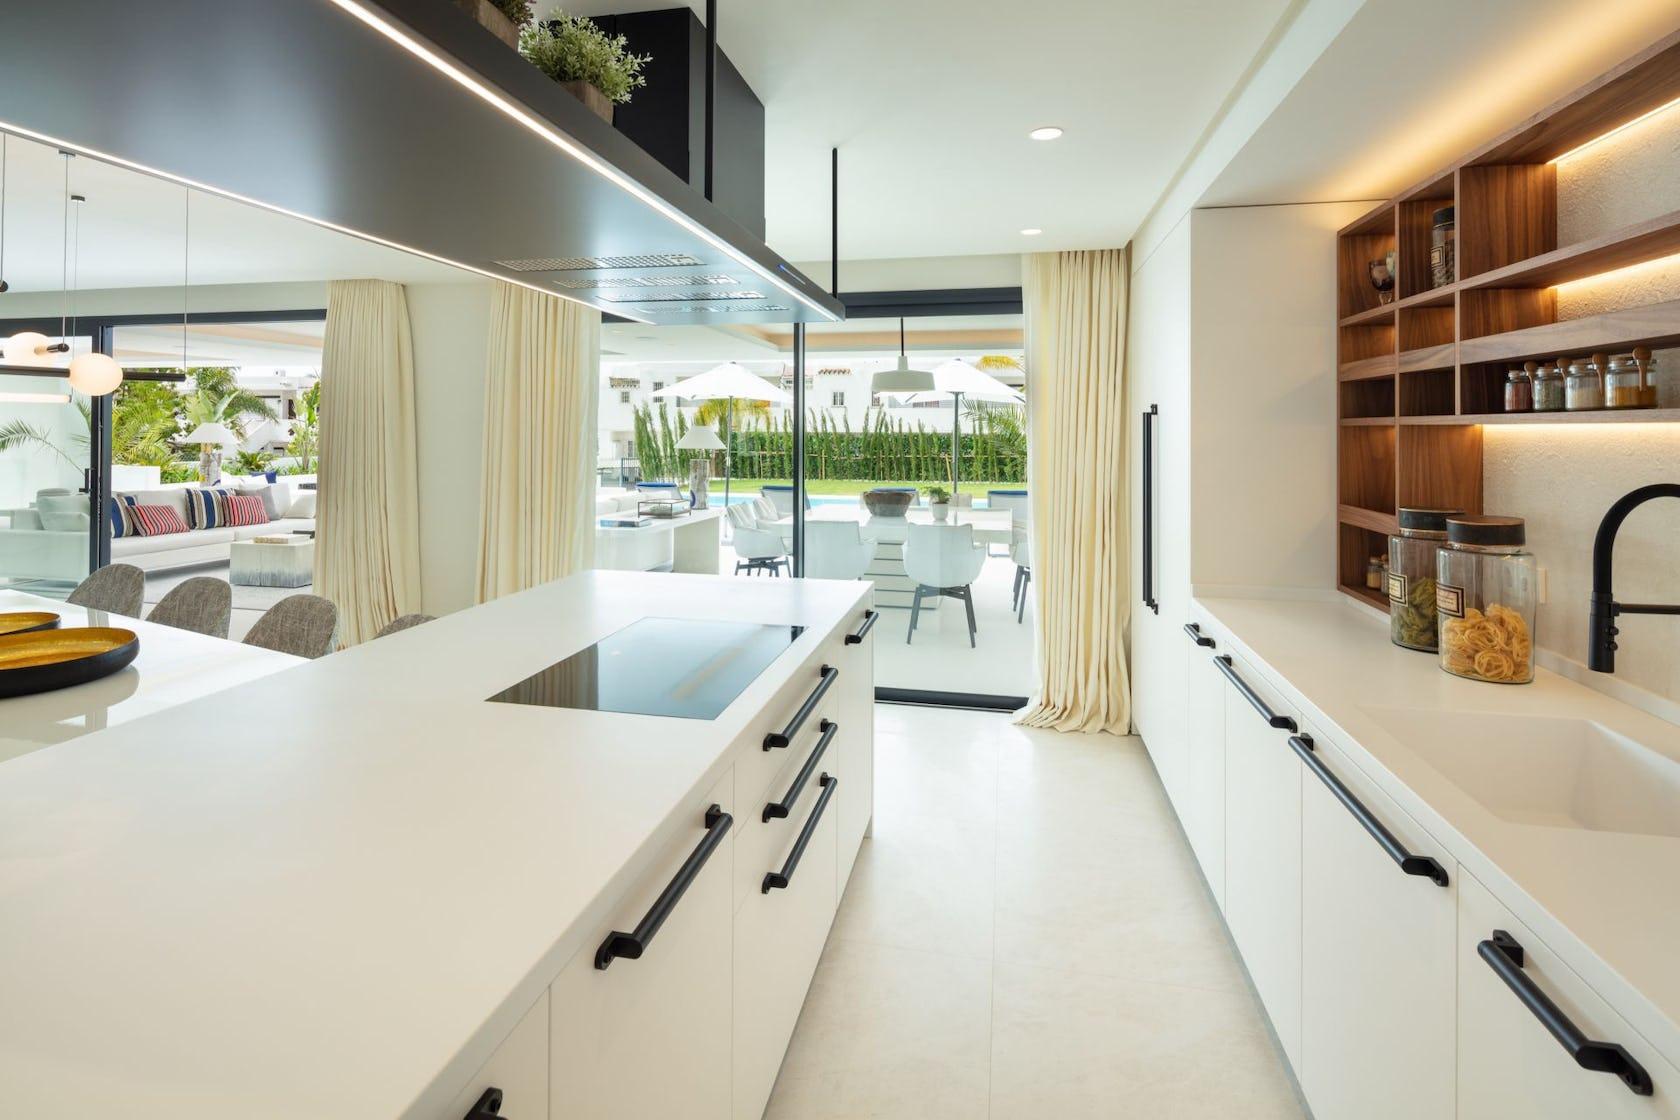 indoors room interior design kitchen